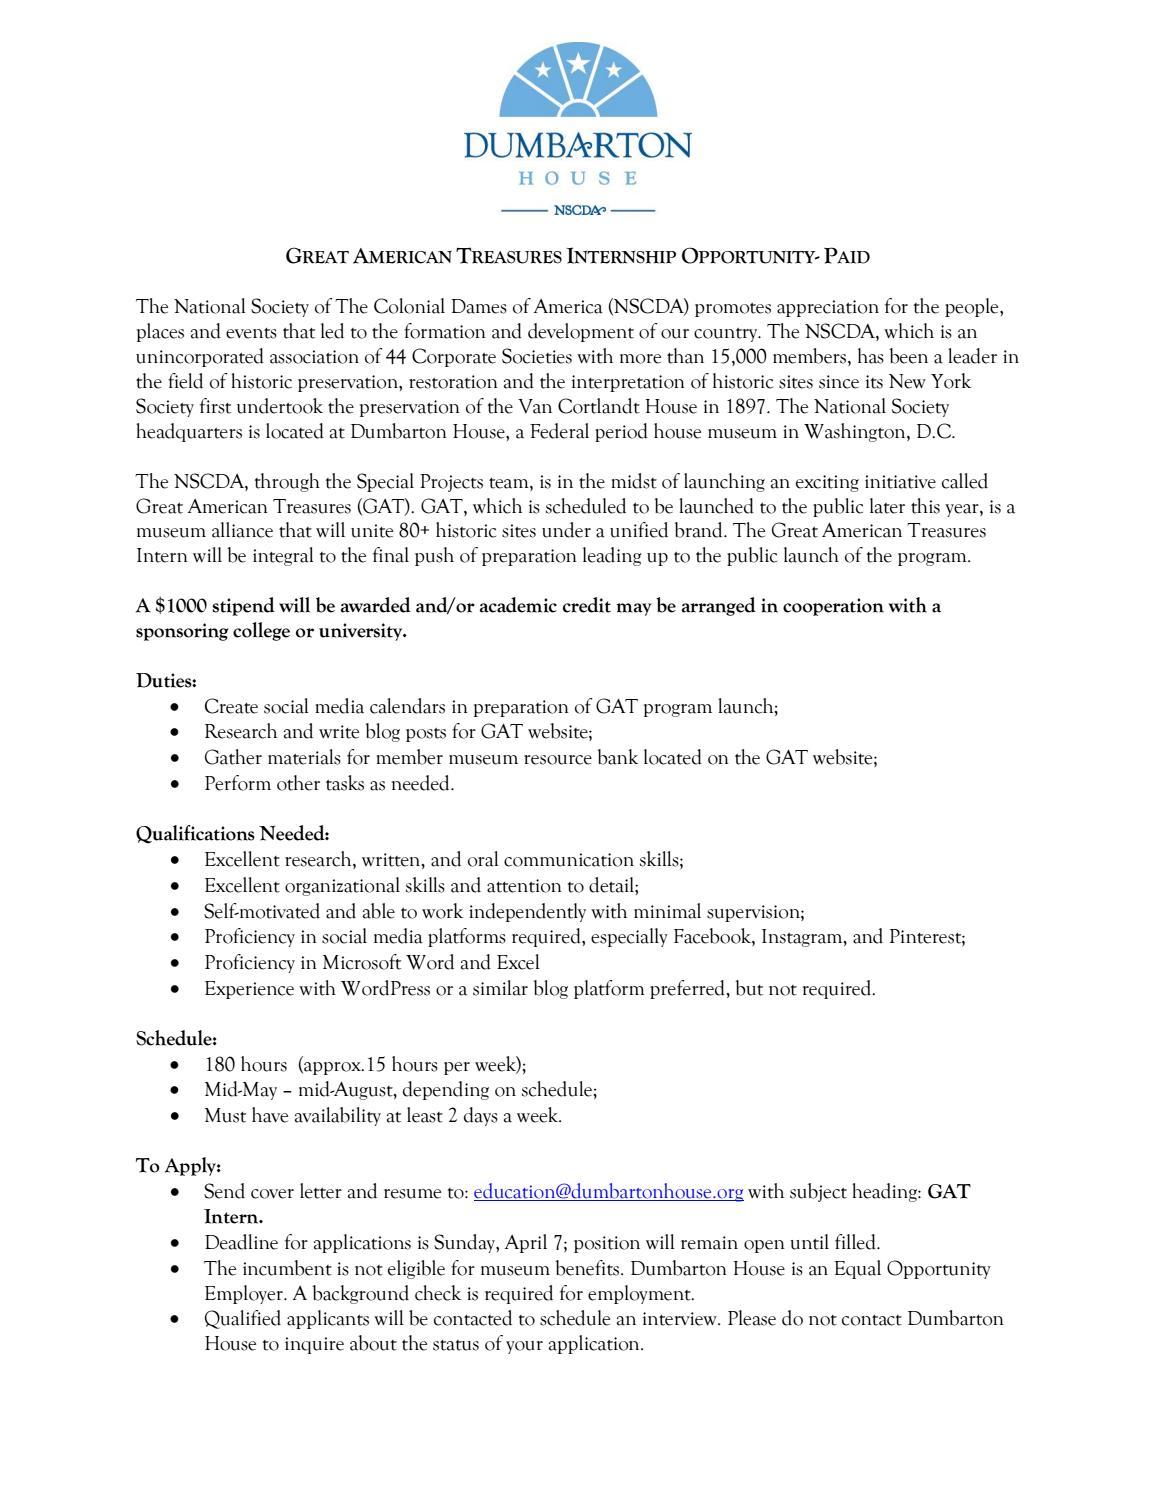 paid-summer-great-american-treasures-internship by Dumbarton